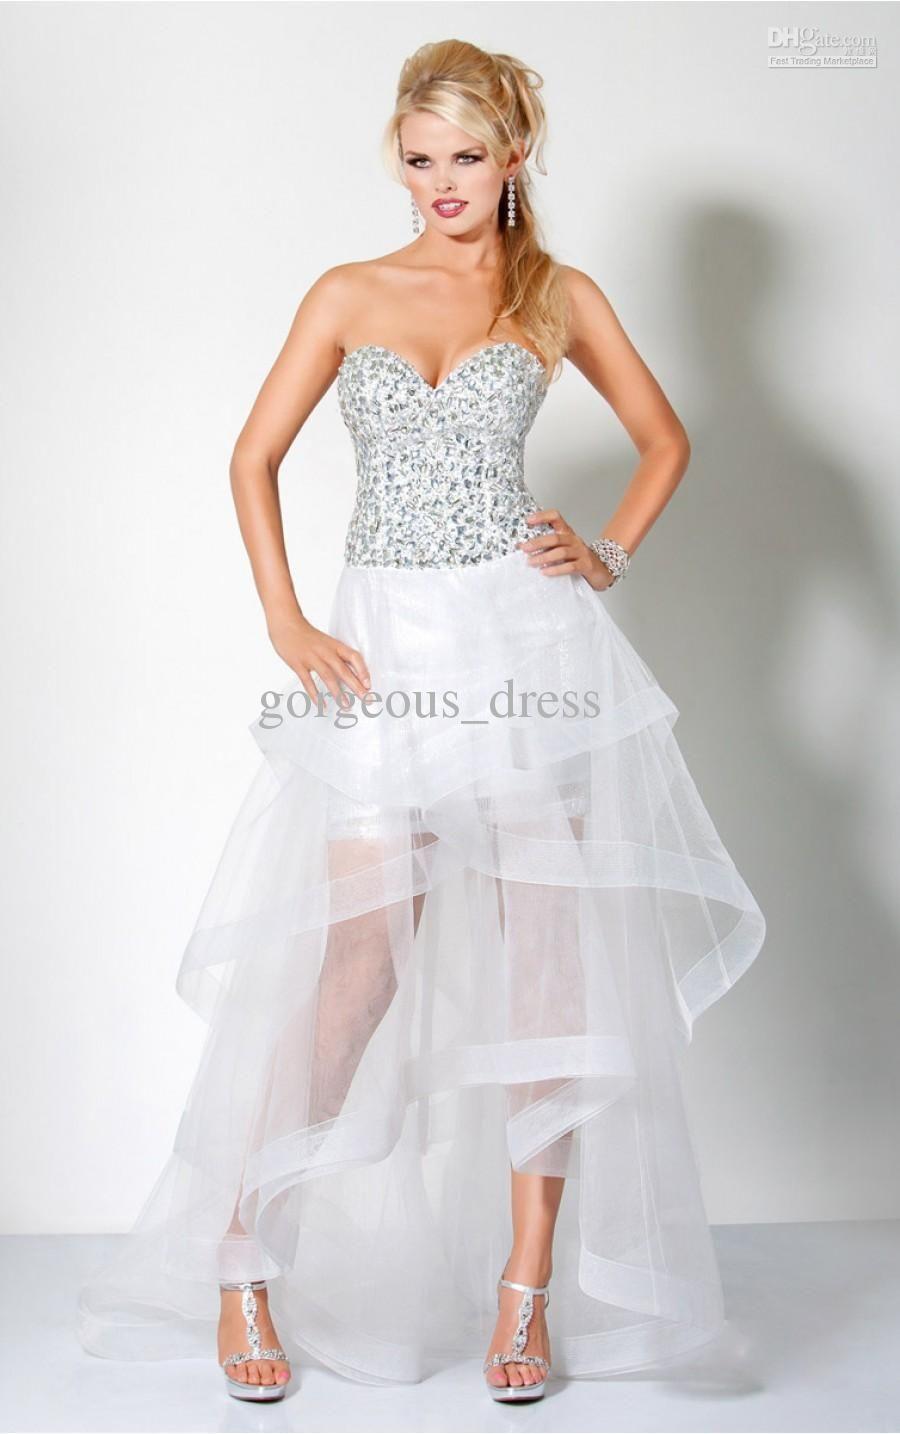 White Rhinestone Prom Dresses